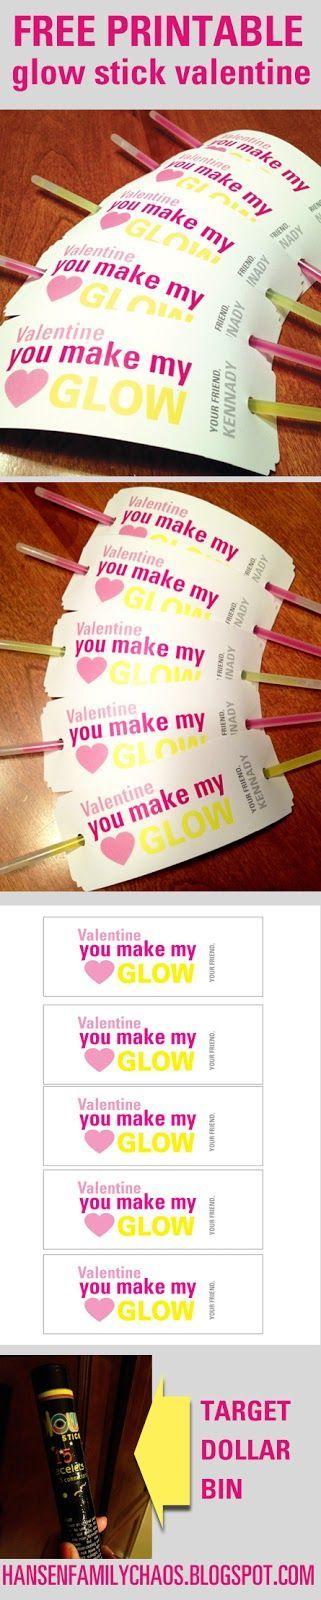 Valentines Day idea - good picture